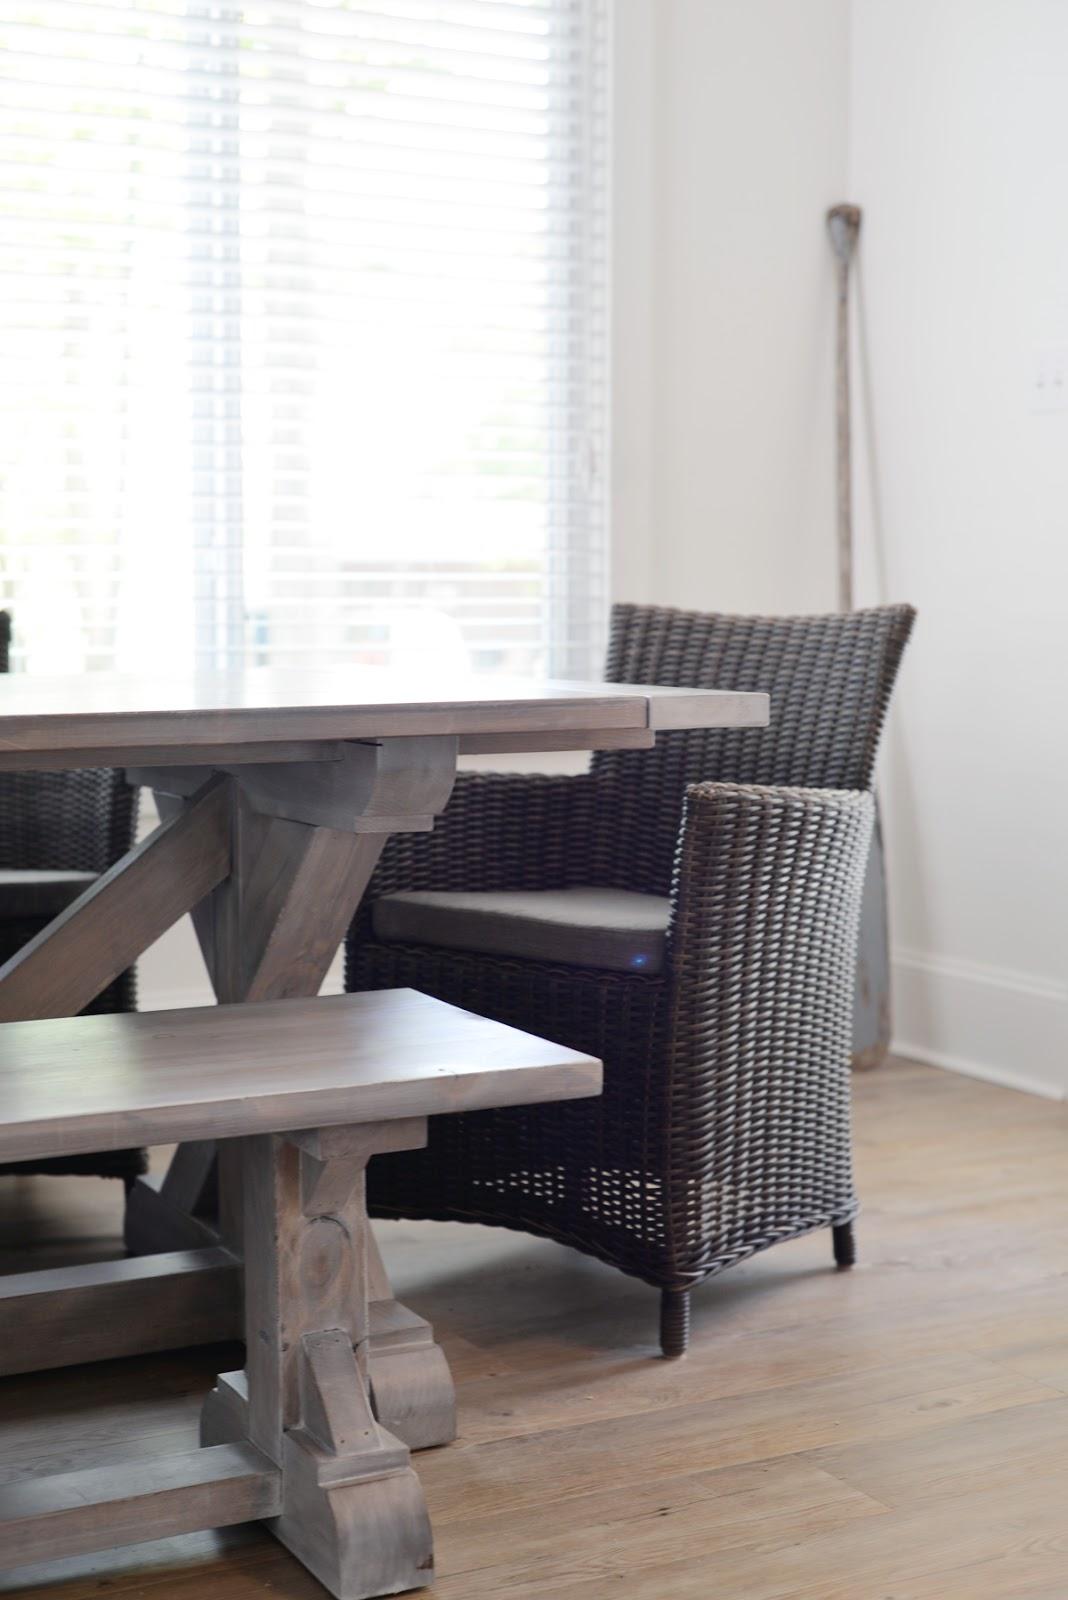 Ramblingrenovators.ca   custom handmade rustic x-base farmhouse table with beachy stain finish